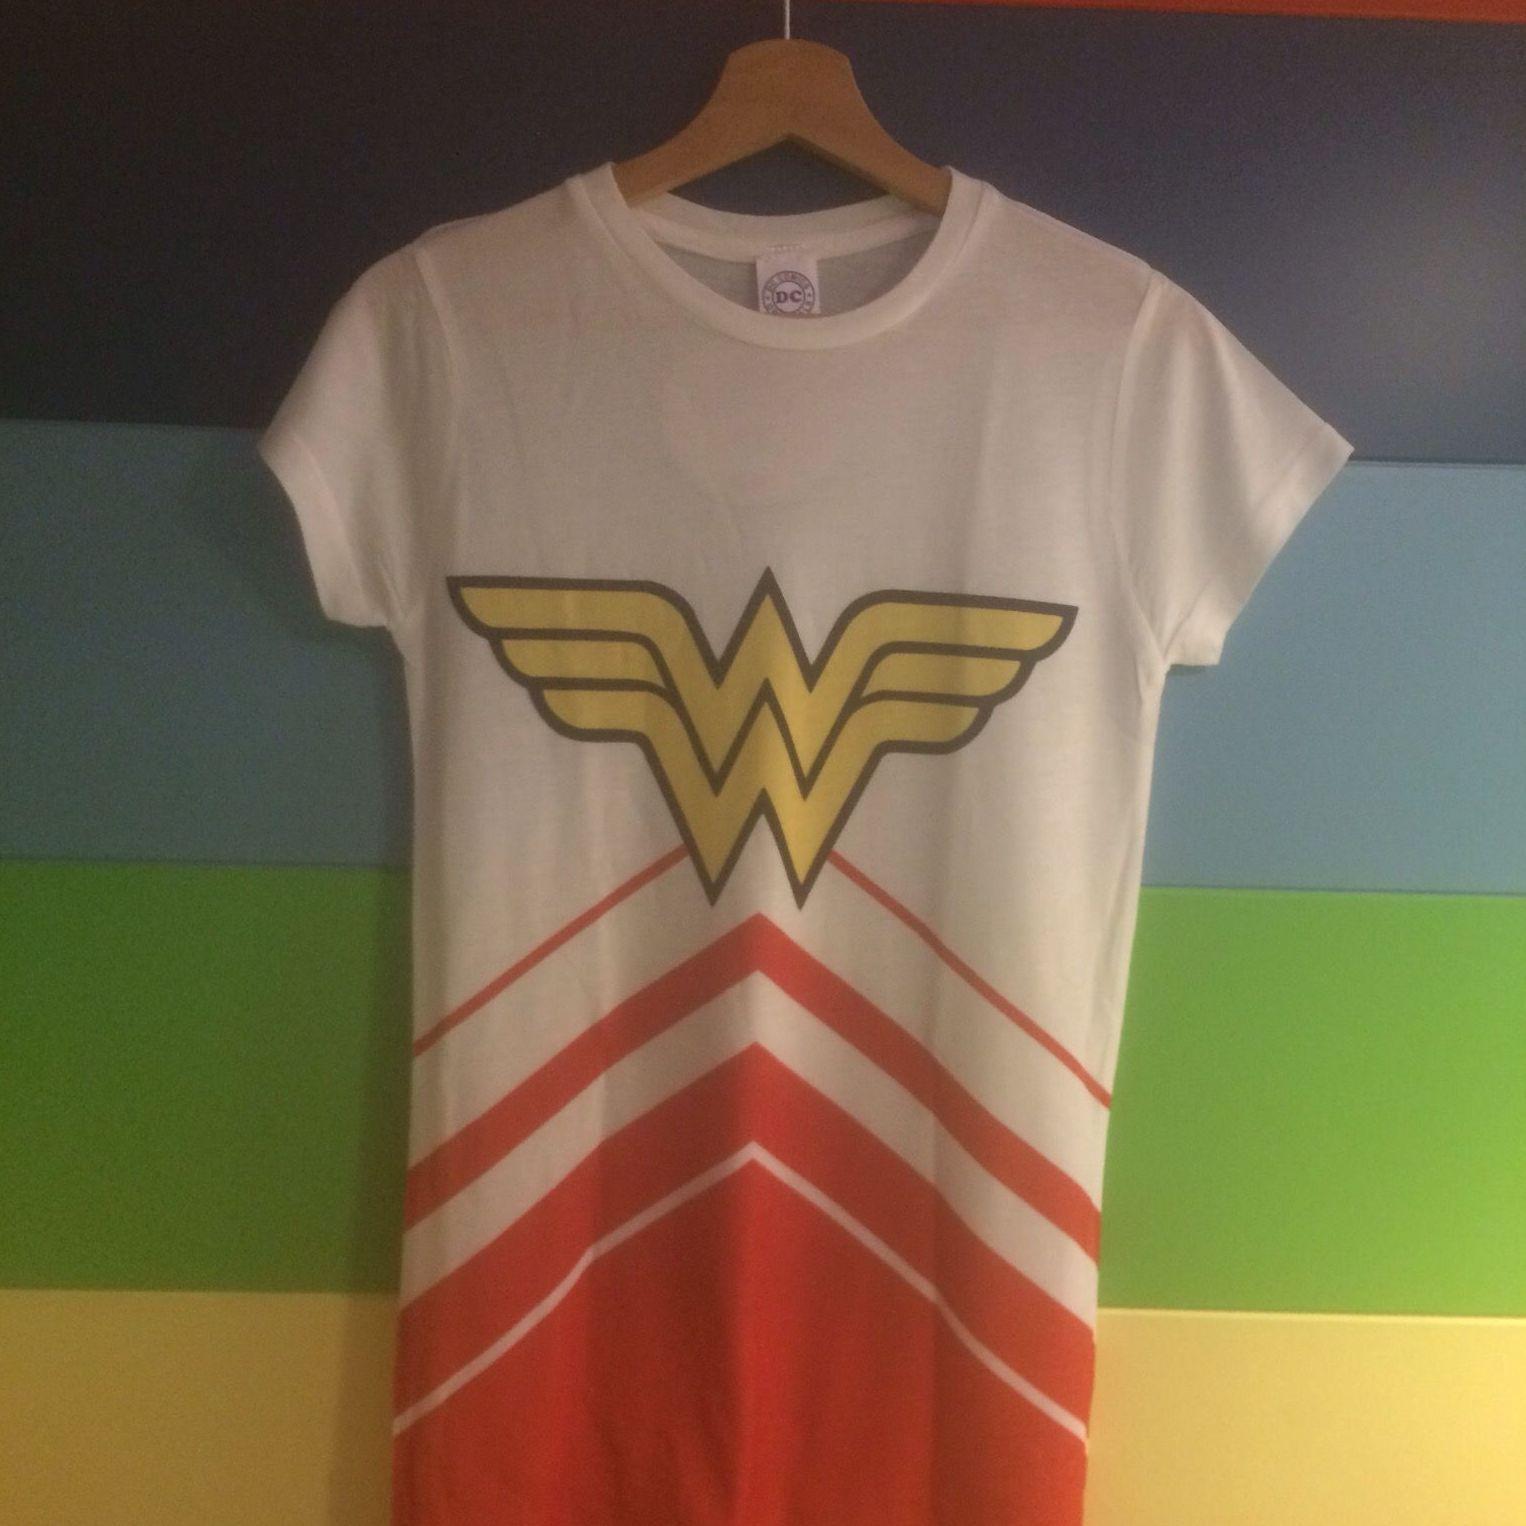 Camiseta Wonder Woman: Productos de 22Vintidós